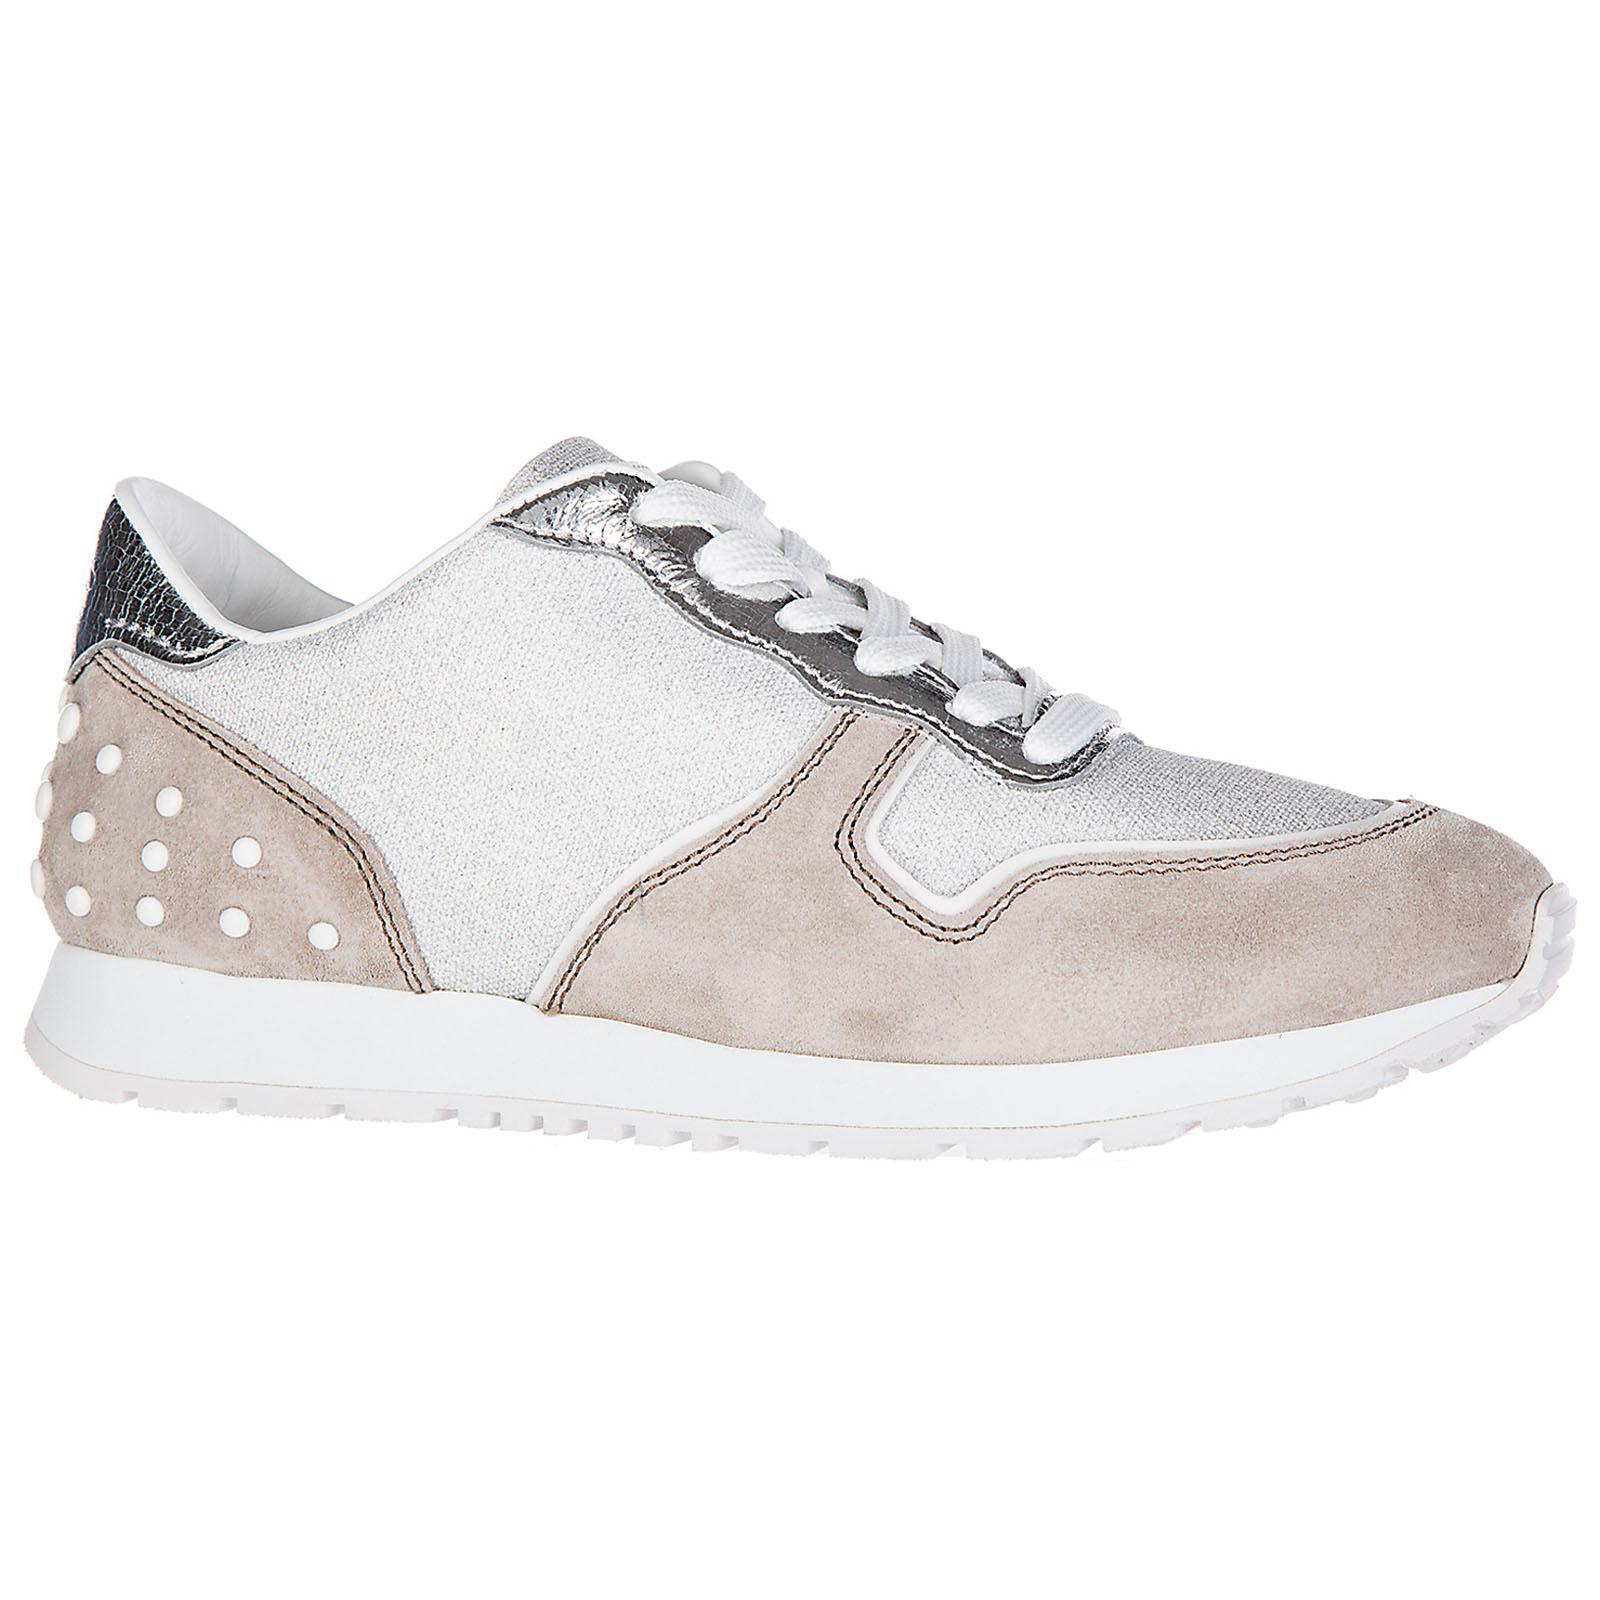 Chaussures baskets sneakers femme en daim sportivo